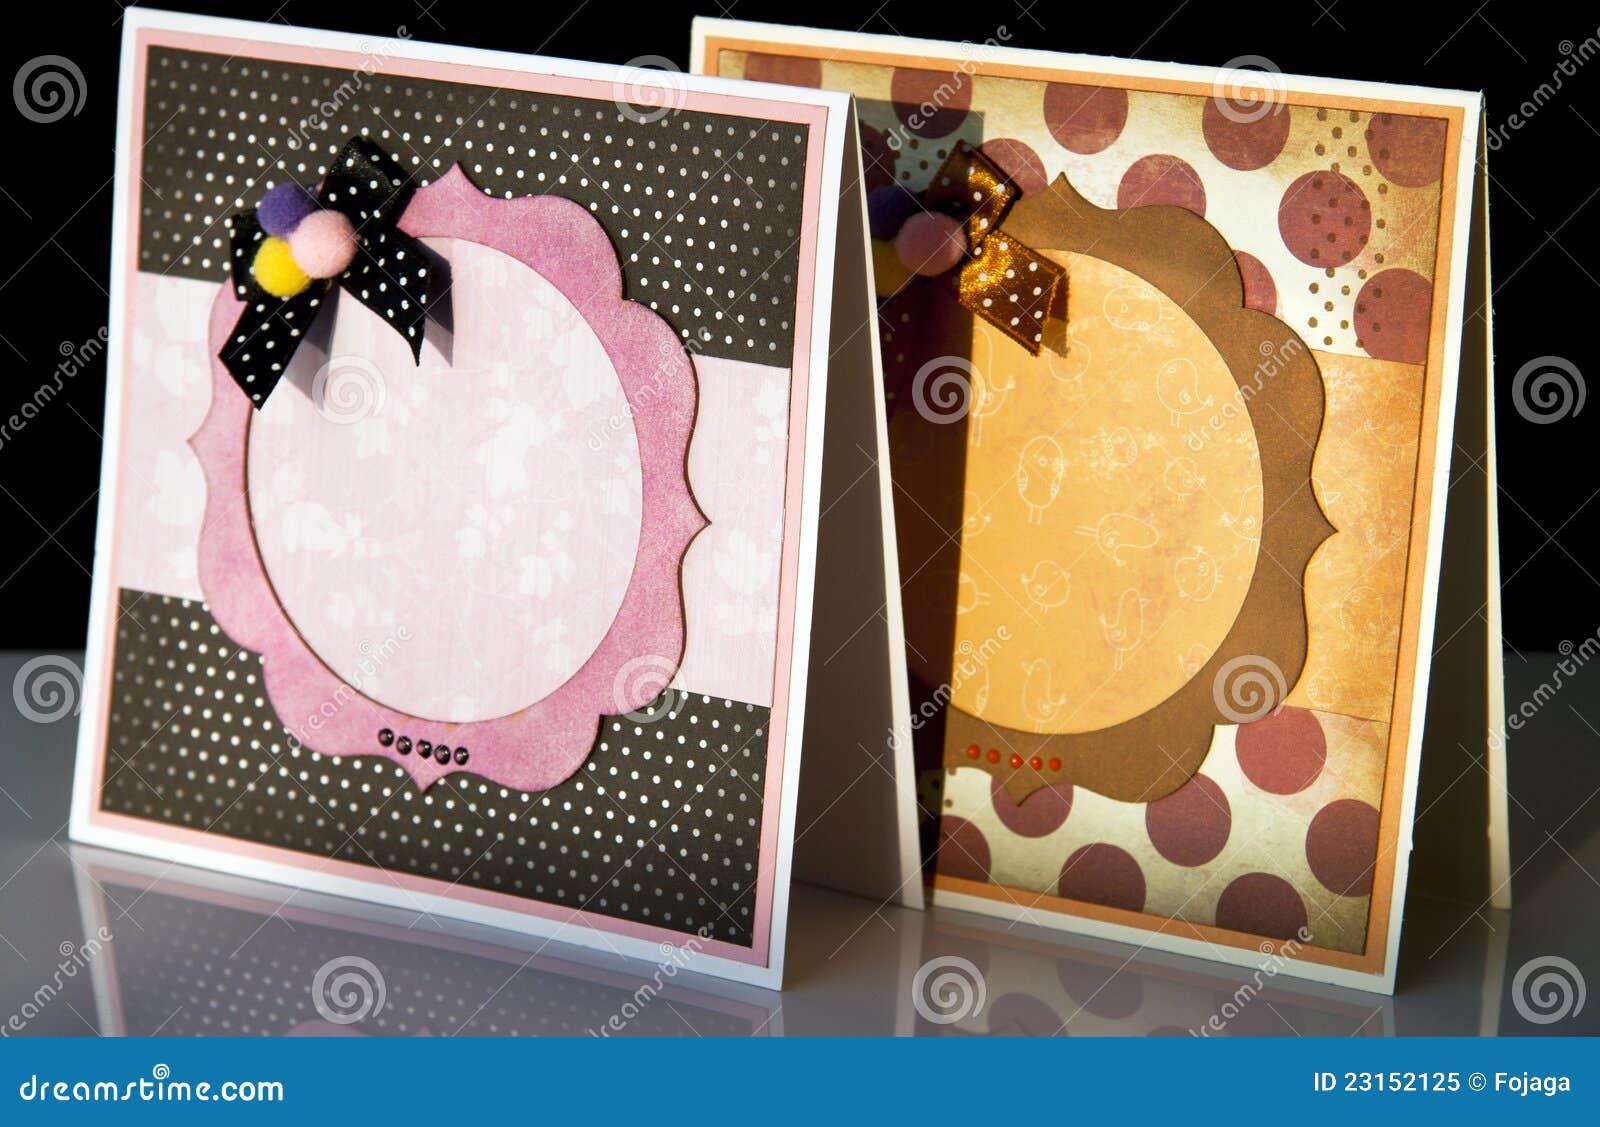 Handmade frames stock image. Image of background, back - 23152125